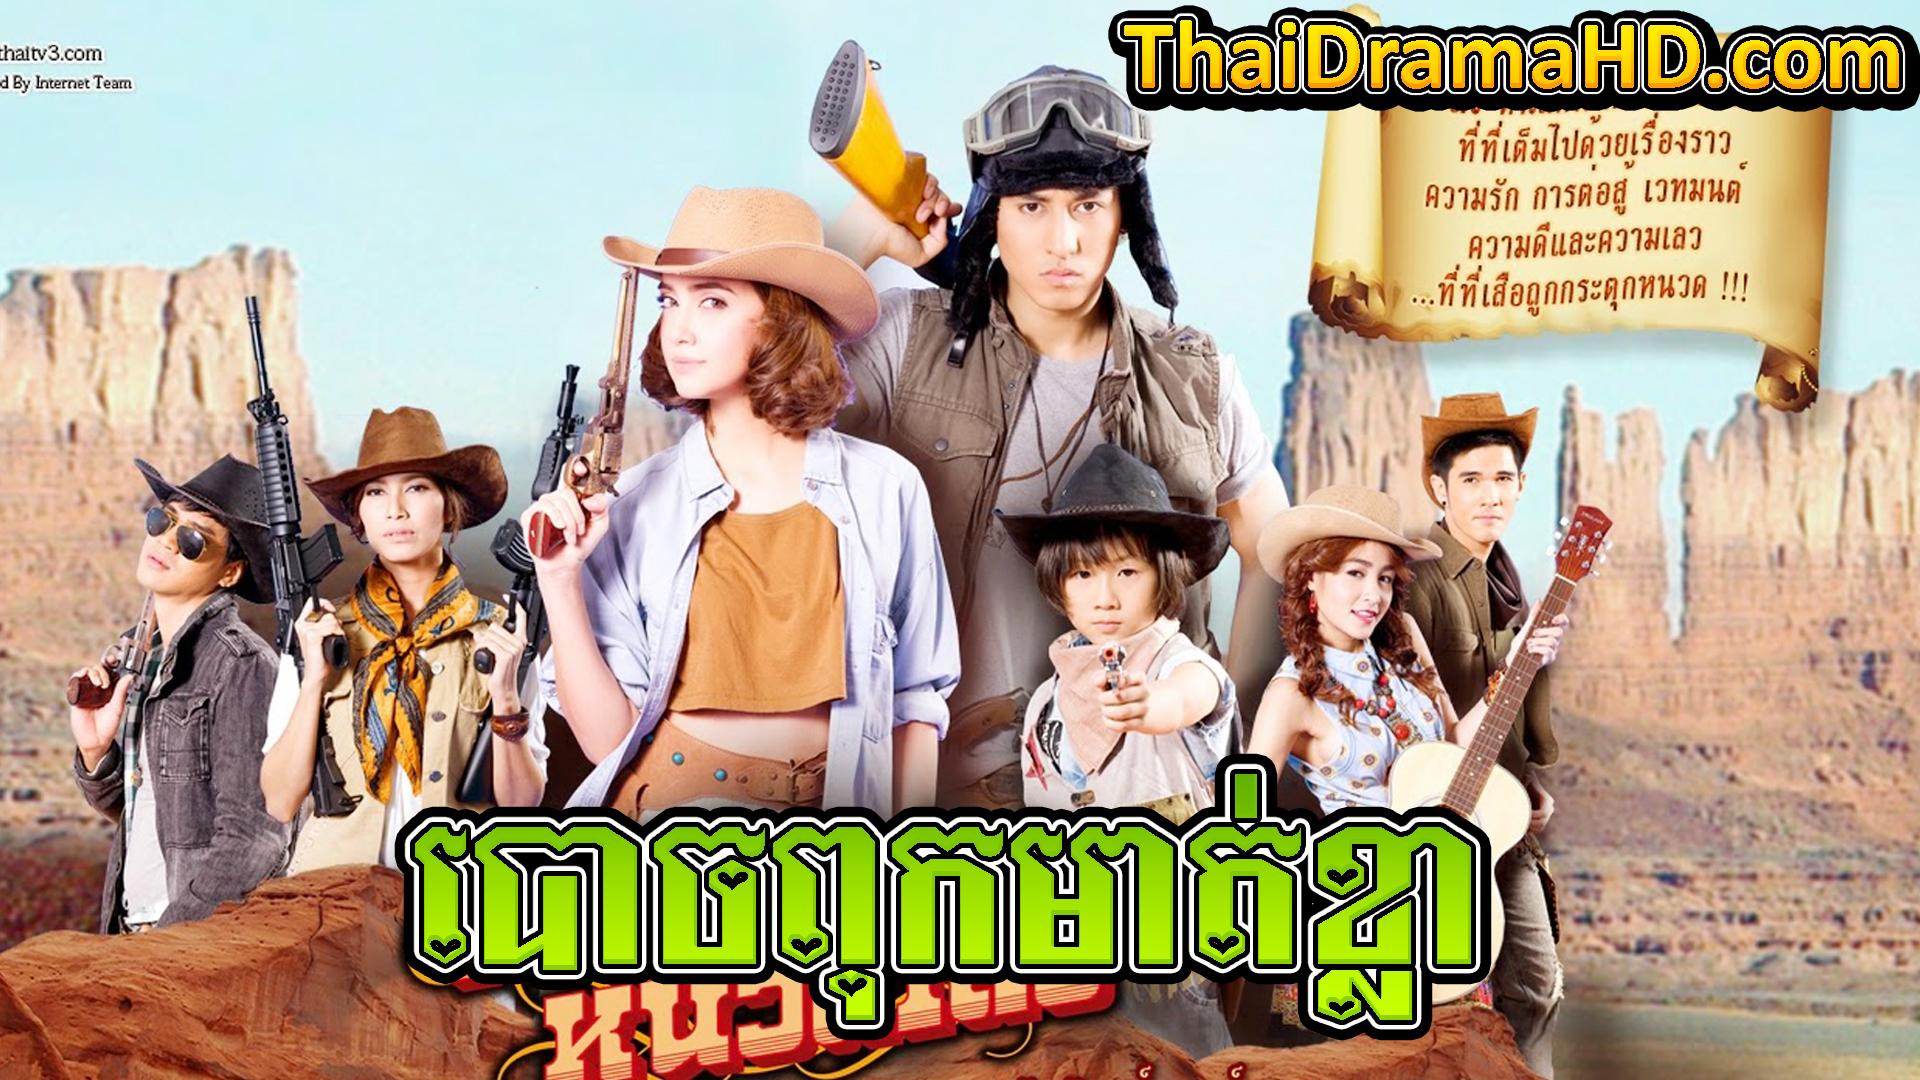 Boach Puk Moat Khla | Thai Drama | Khmer Movie | Phumikhmer | movie-khmer | video4khmer | khmotions | kolabkhmer | khmer drama | ksdrama | cookingtips | roscheat | khmertimeskh | khmerkomsan | phumi7 | merlkon | film2us | movie2kh | sweetdrama | khmercitylove | khreplay | tvb cambodia drama | ckh7 | srokthai | phumimedia | phumi8 | khmer avenue | khmer search | Soyo | khmerfans